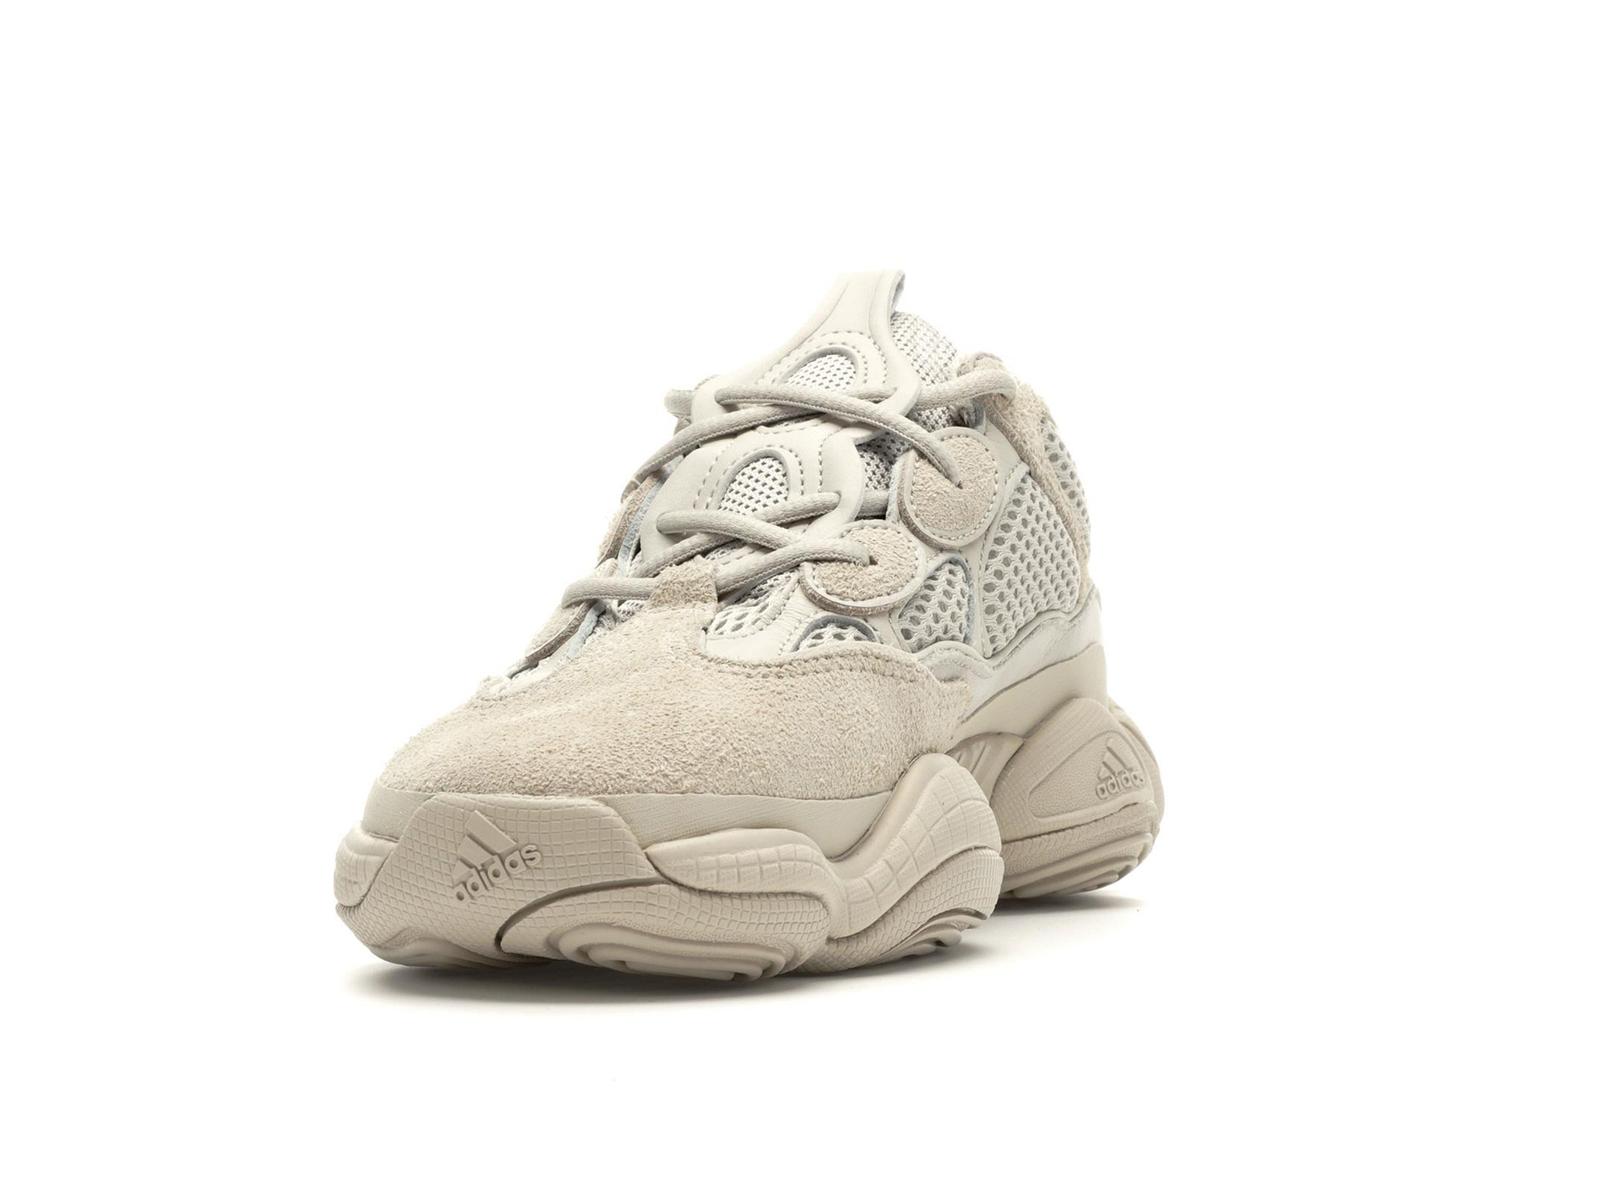 e04527c6 Adidas YEEZY 500 Blush - магазин модной обуви Stepshop